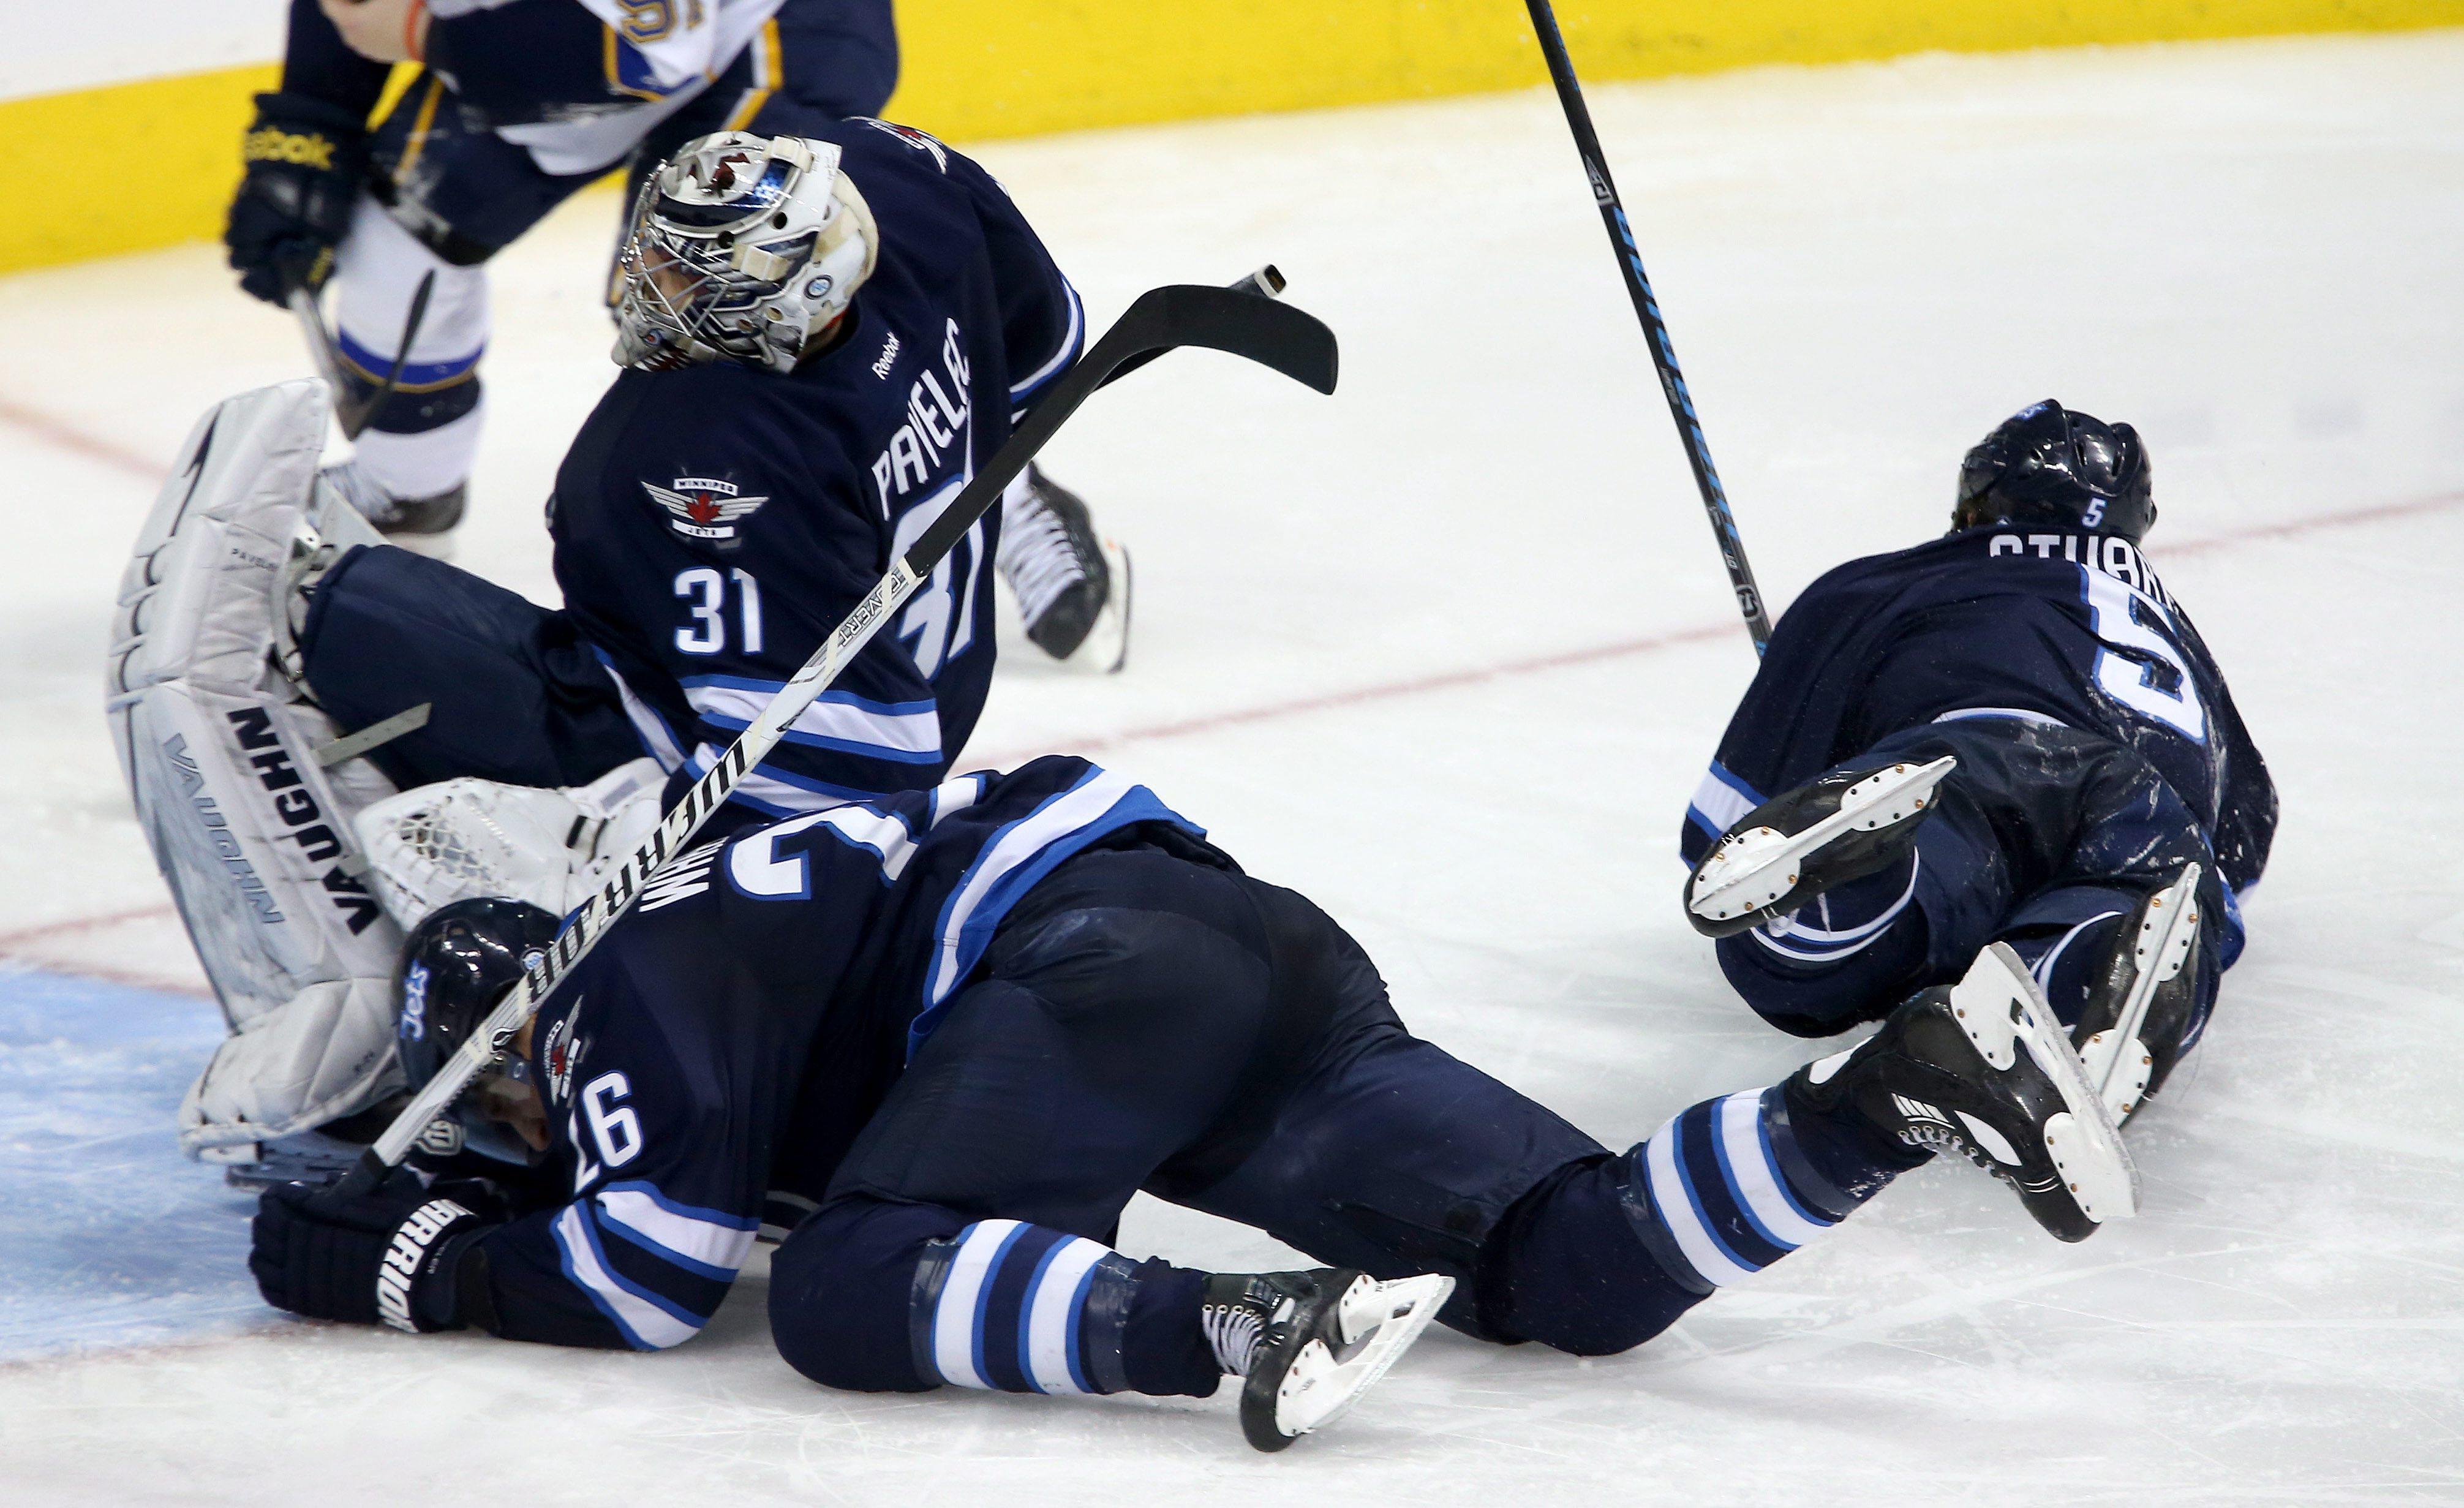 Winnipeg Jets' goaltender Ondrej Pavelec (31) falls onto Blake Wheeler (26) as Mark Stuart (5) lays on the ice nearby during third period NHL hockey action against the St. Louis Blues' in Winnipeg, Tuesday,  Dec. 10, 2013